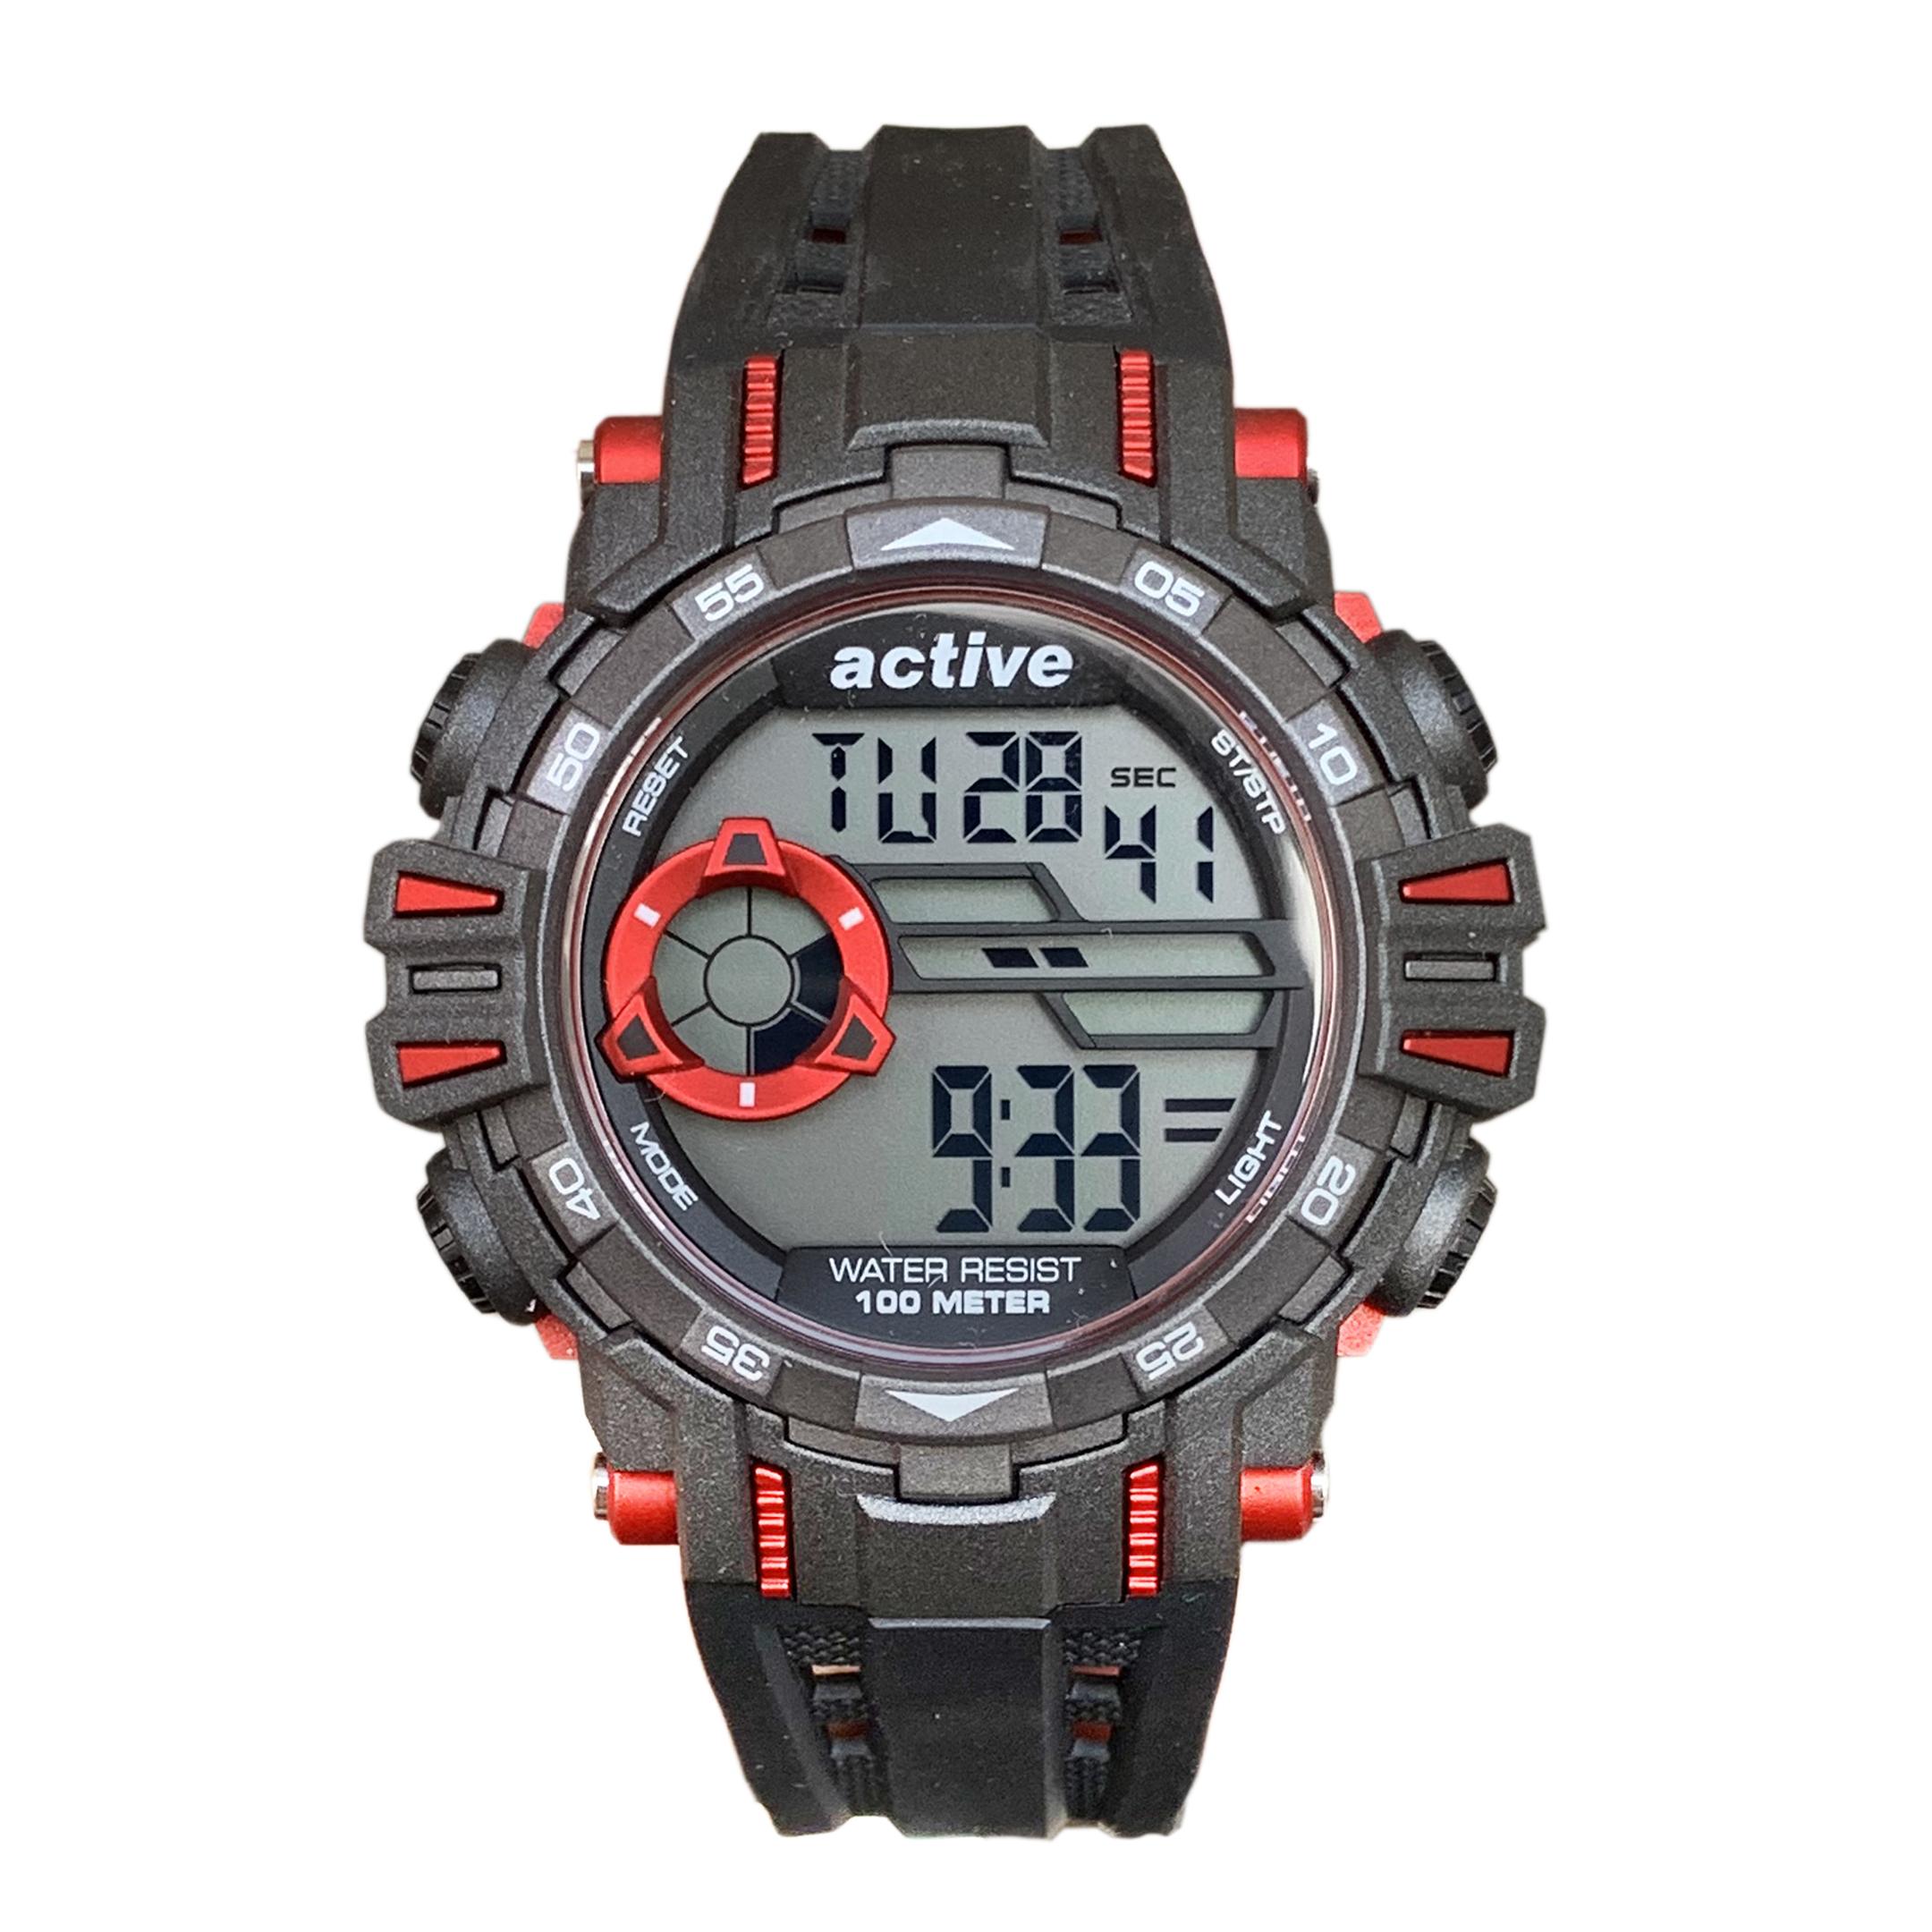 ساعت مچی دیجیتال مردانه اکتیو مدل yp15671-01